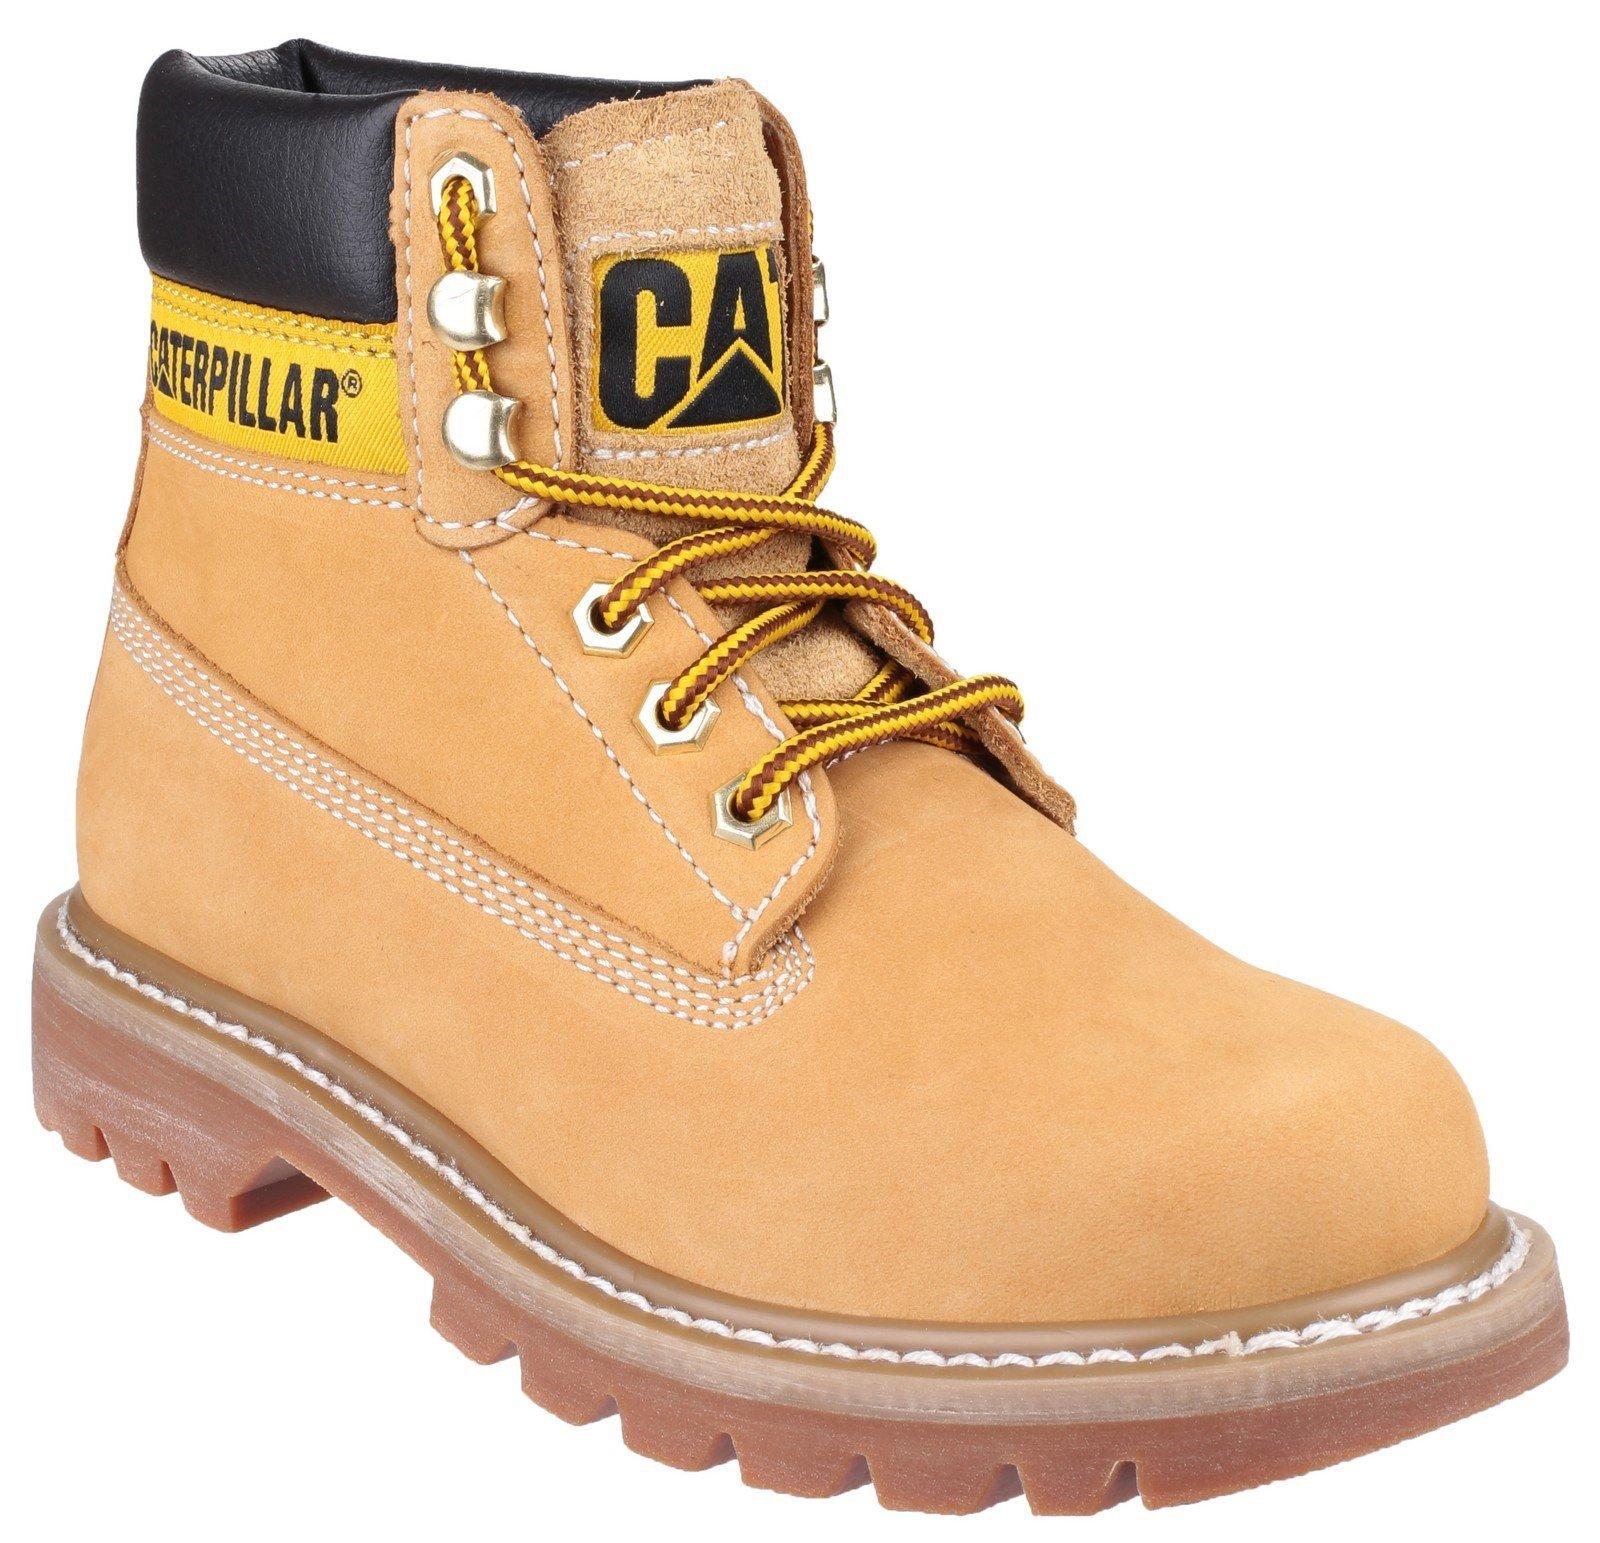 CAT Lifestyle Women's Colorado Lace Up Boot Various Colours 24329 - Honey Reset 8